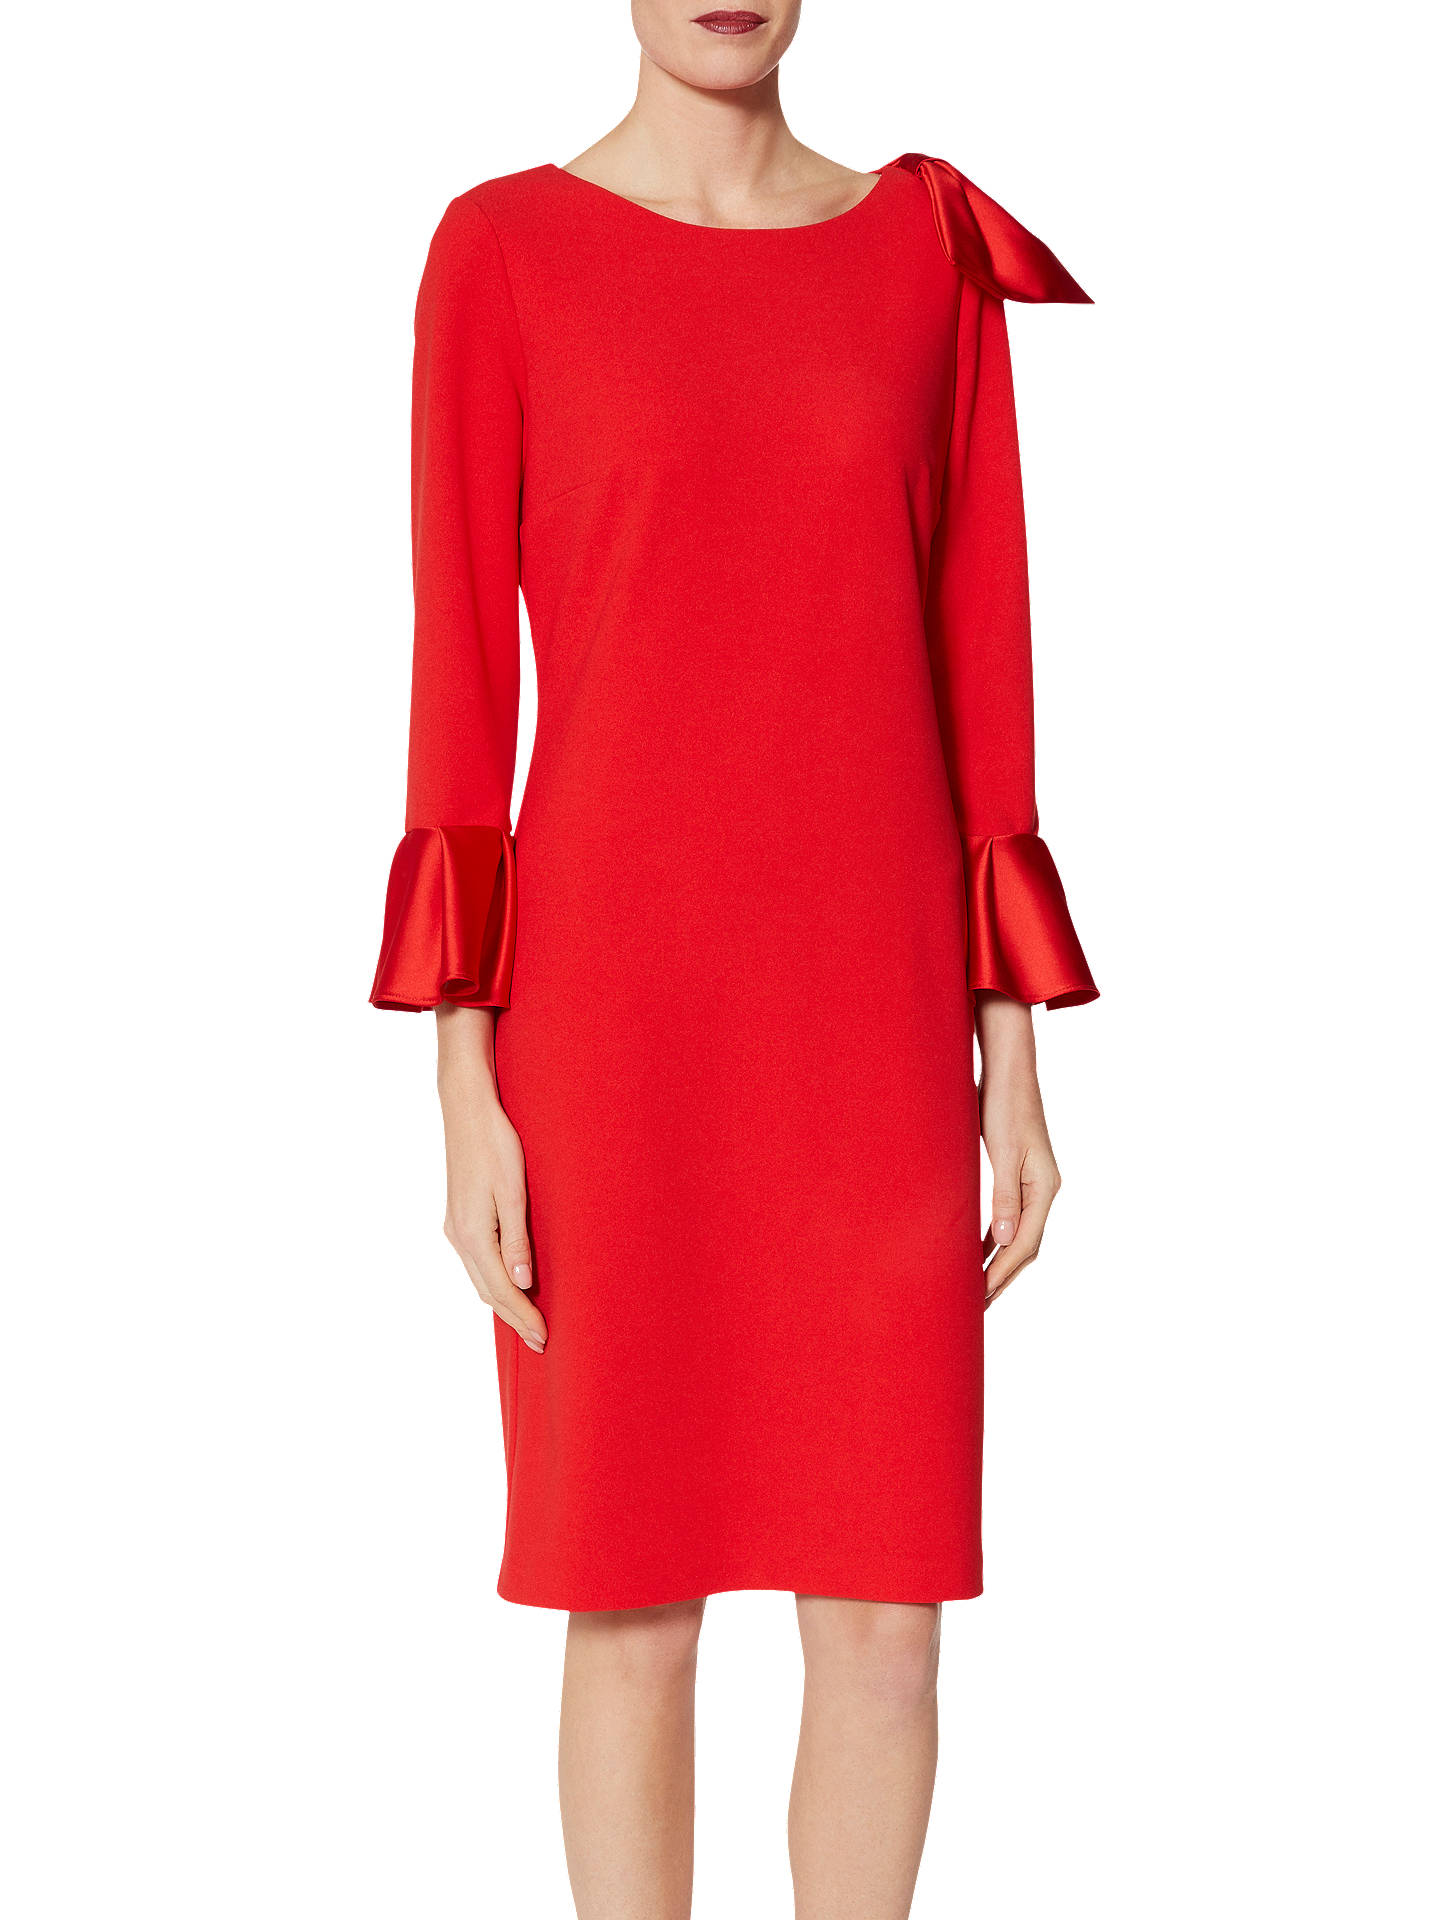 1bdffecf5b5cc Gina Bacconi Uma Satin Detail Scuba Dress, Fire Red